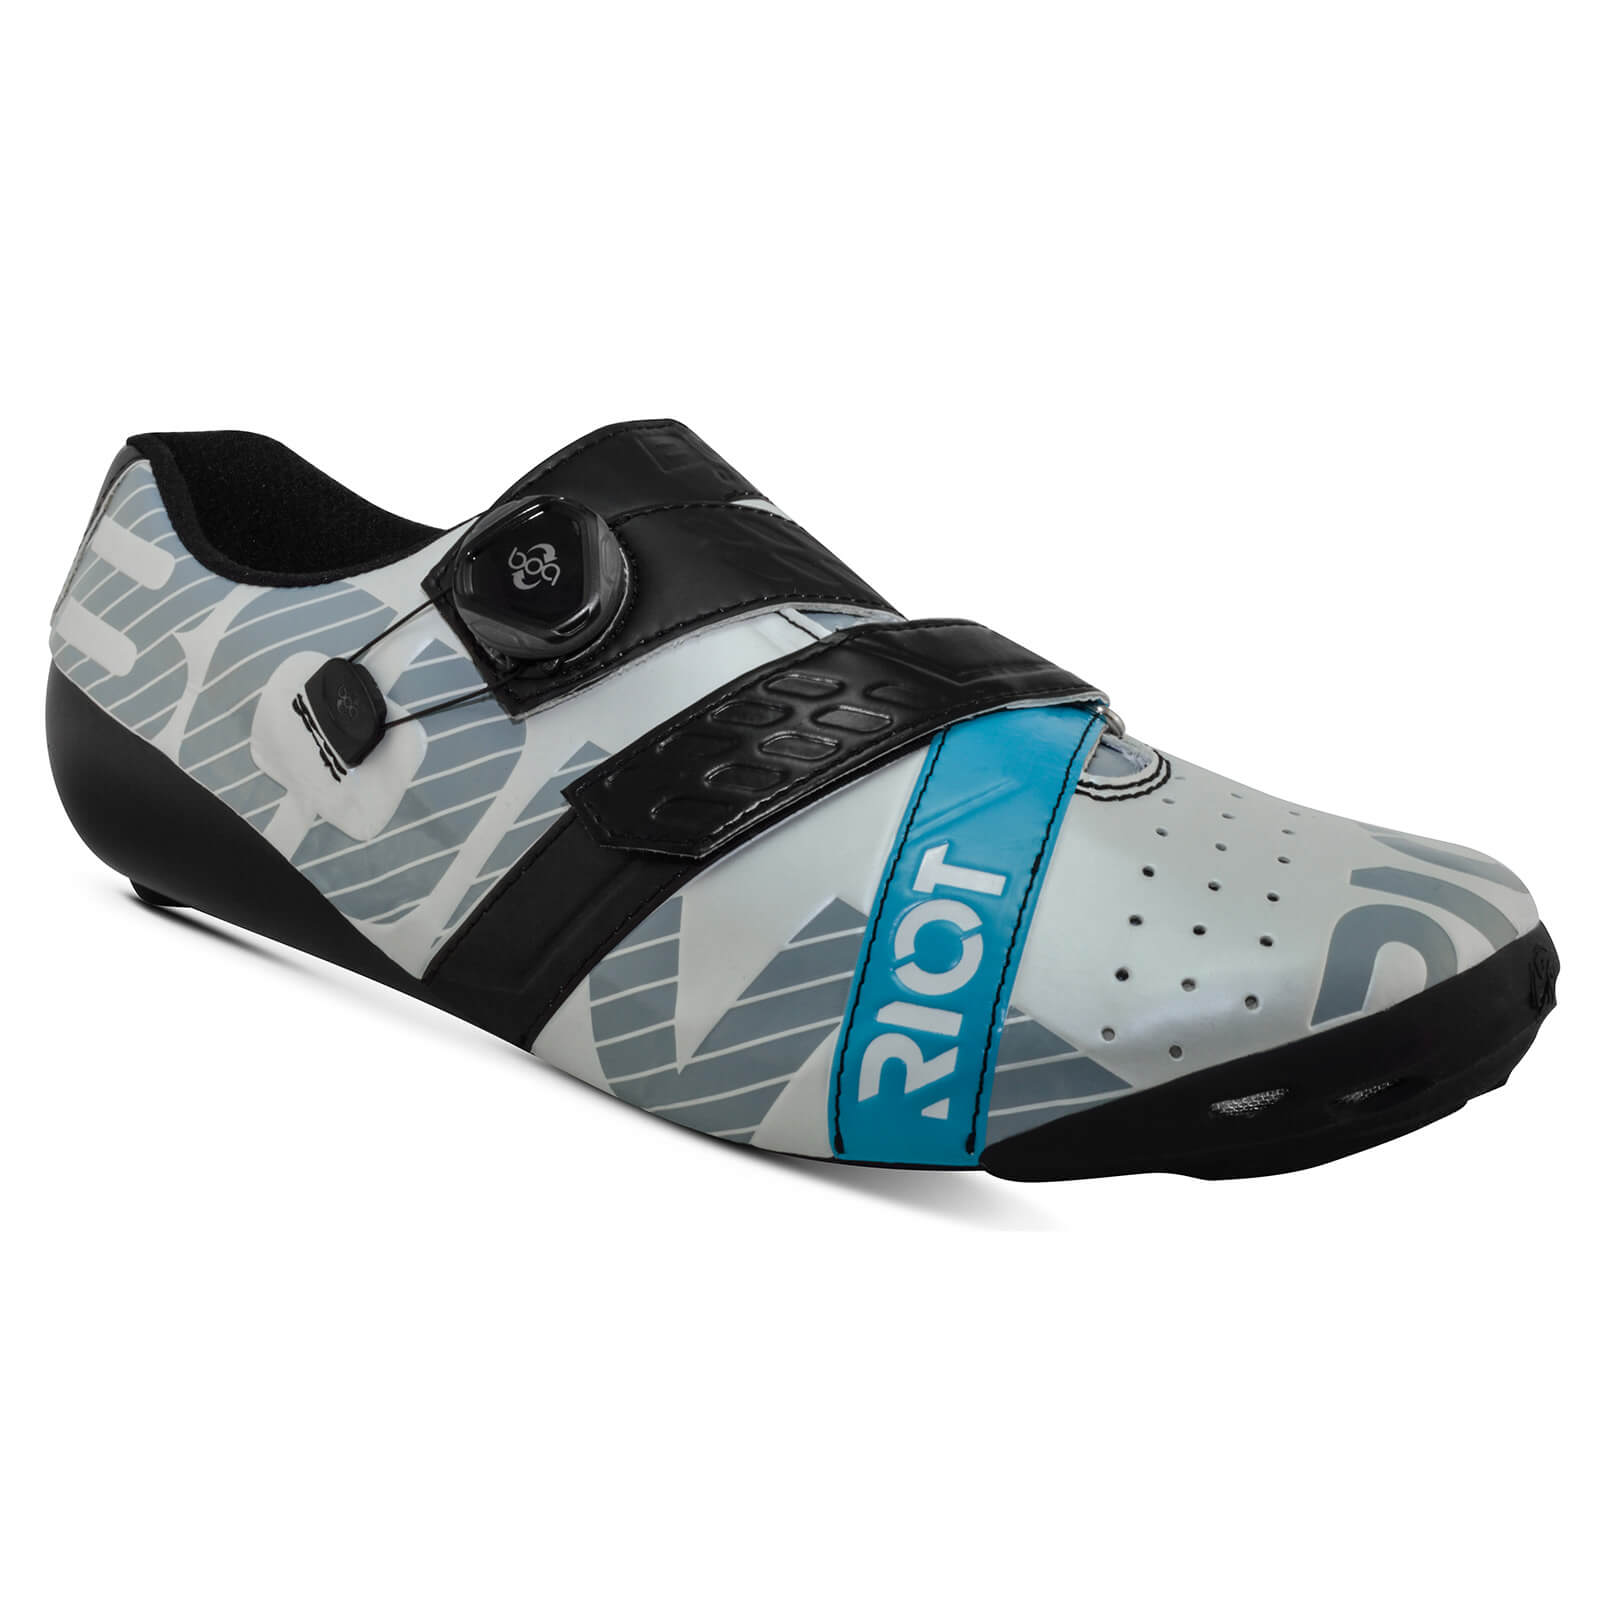 Bont Riot+ Road Shoes - EU 49 - White/Black